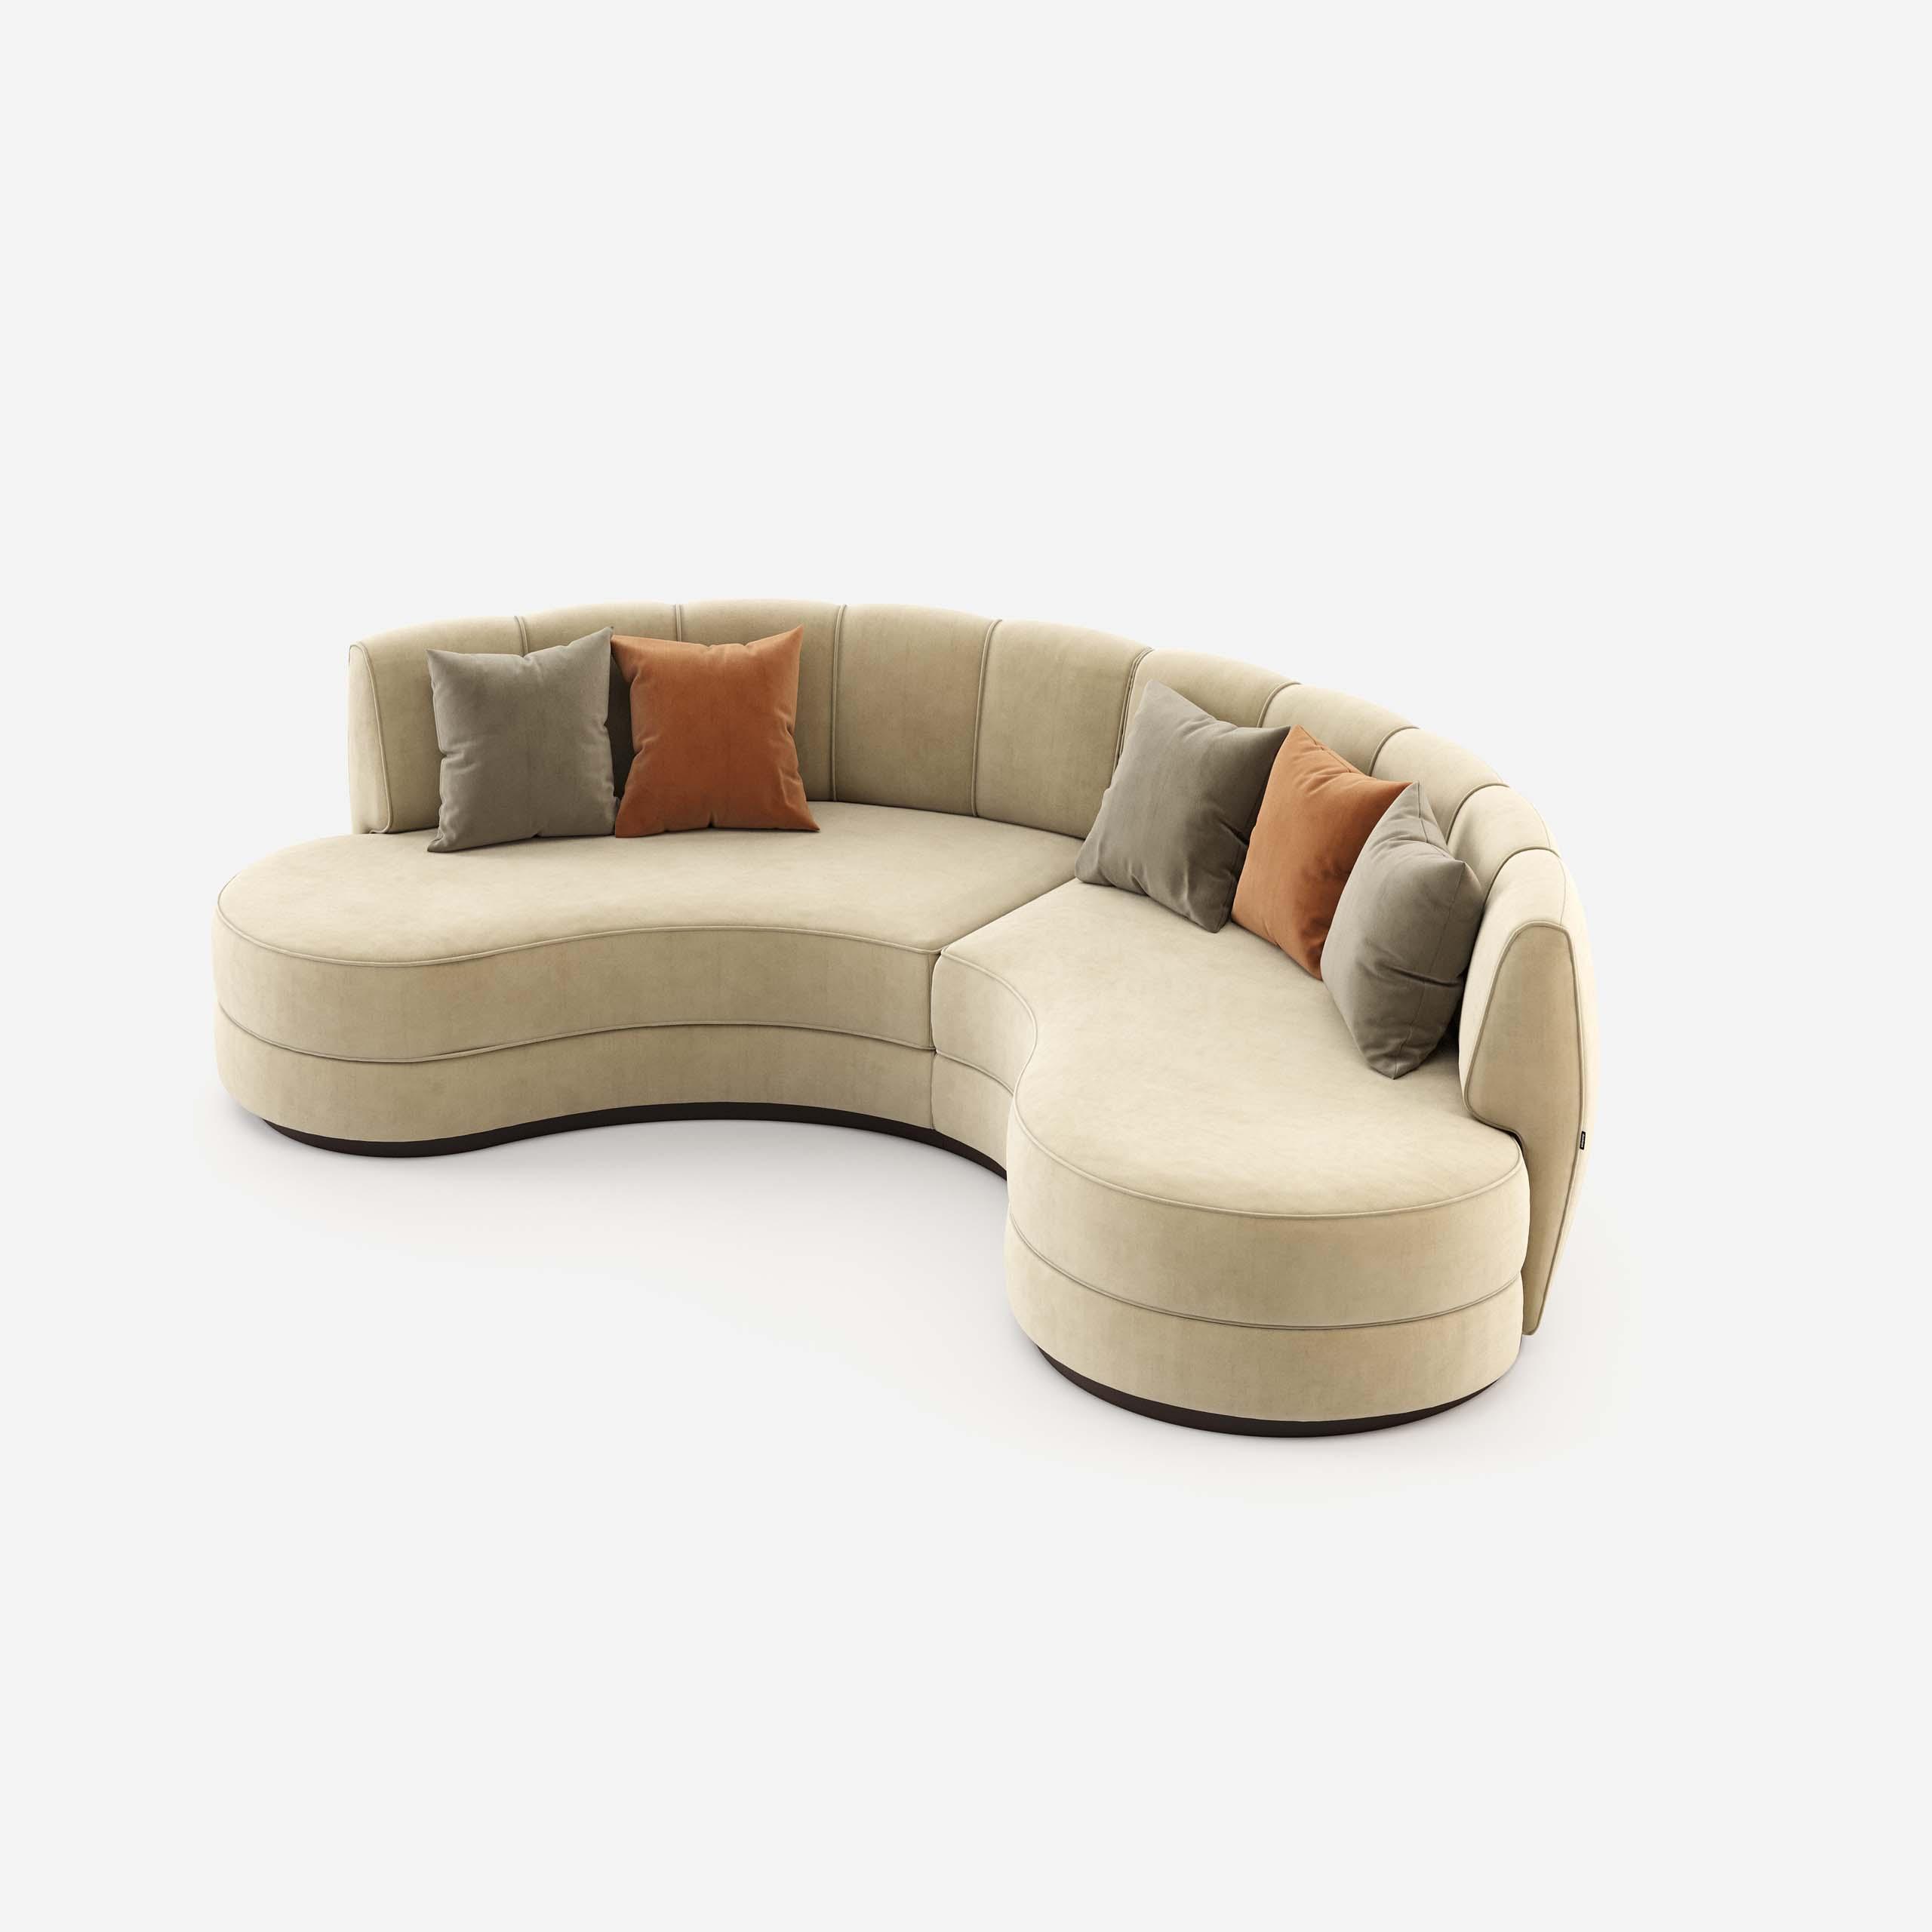 stela-sofa-domkapa-new-collection-2021-living-room-decor